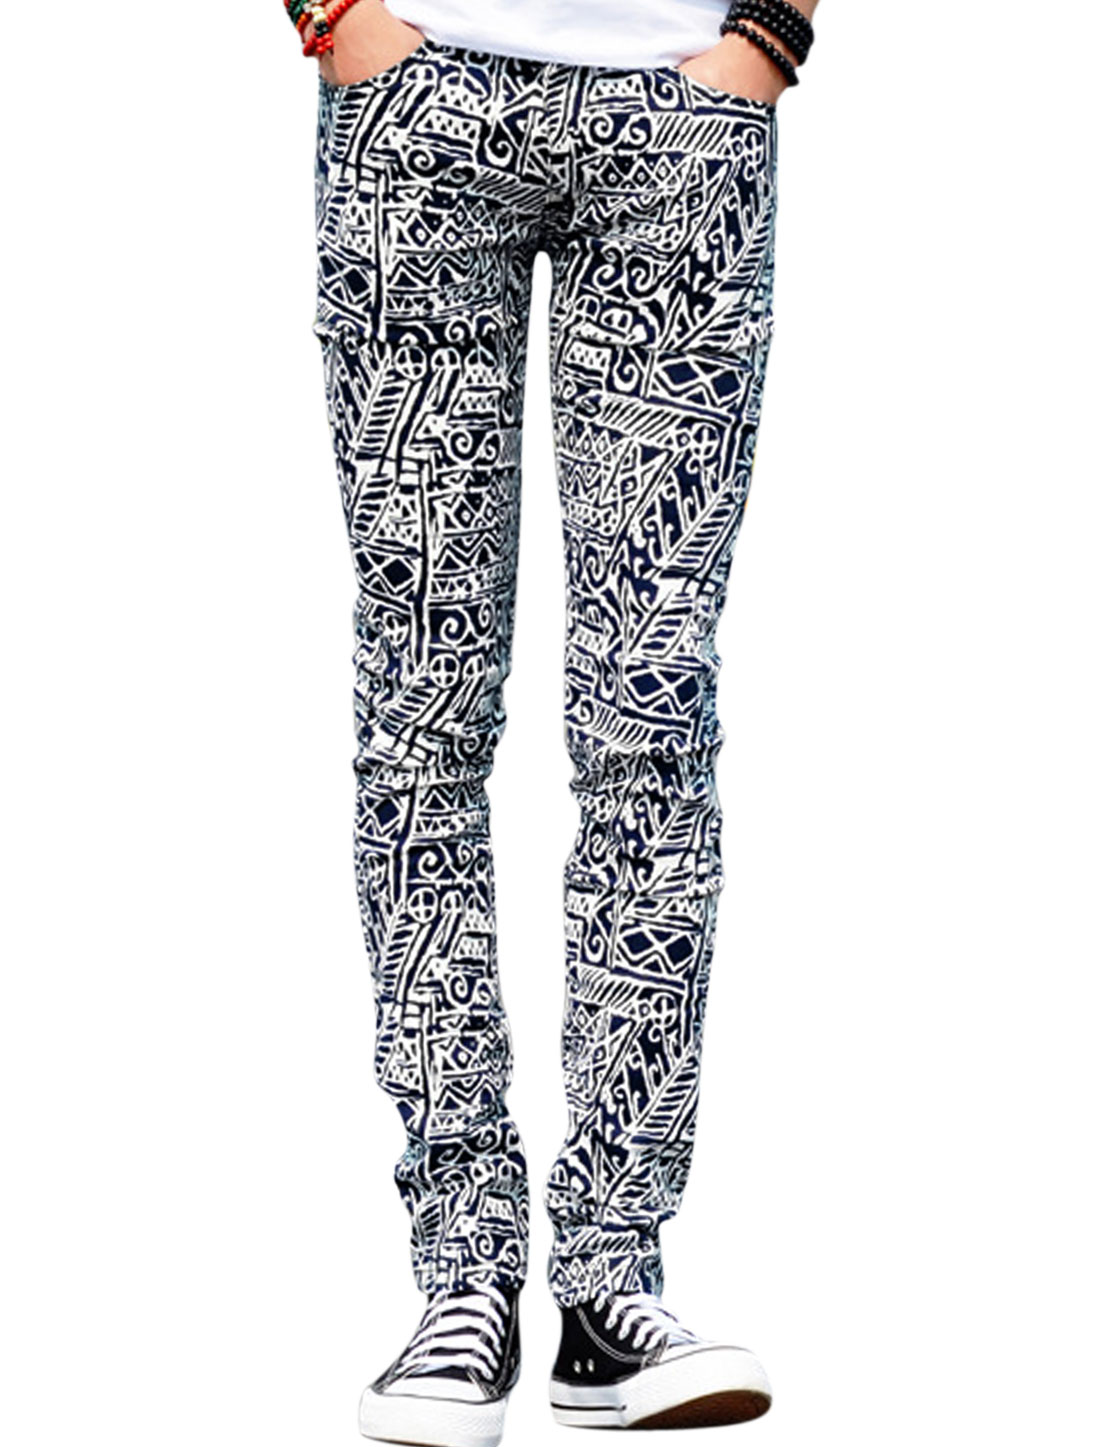 Men Novelty Prints Zip Fly Hip Pockets Back Casual Pants Blacks Whites W28